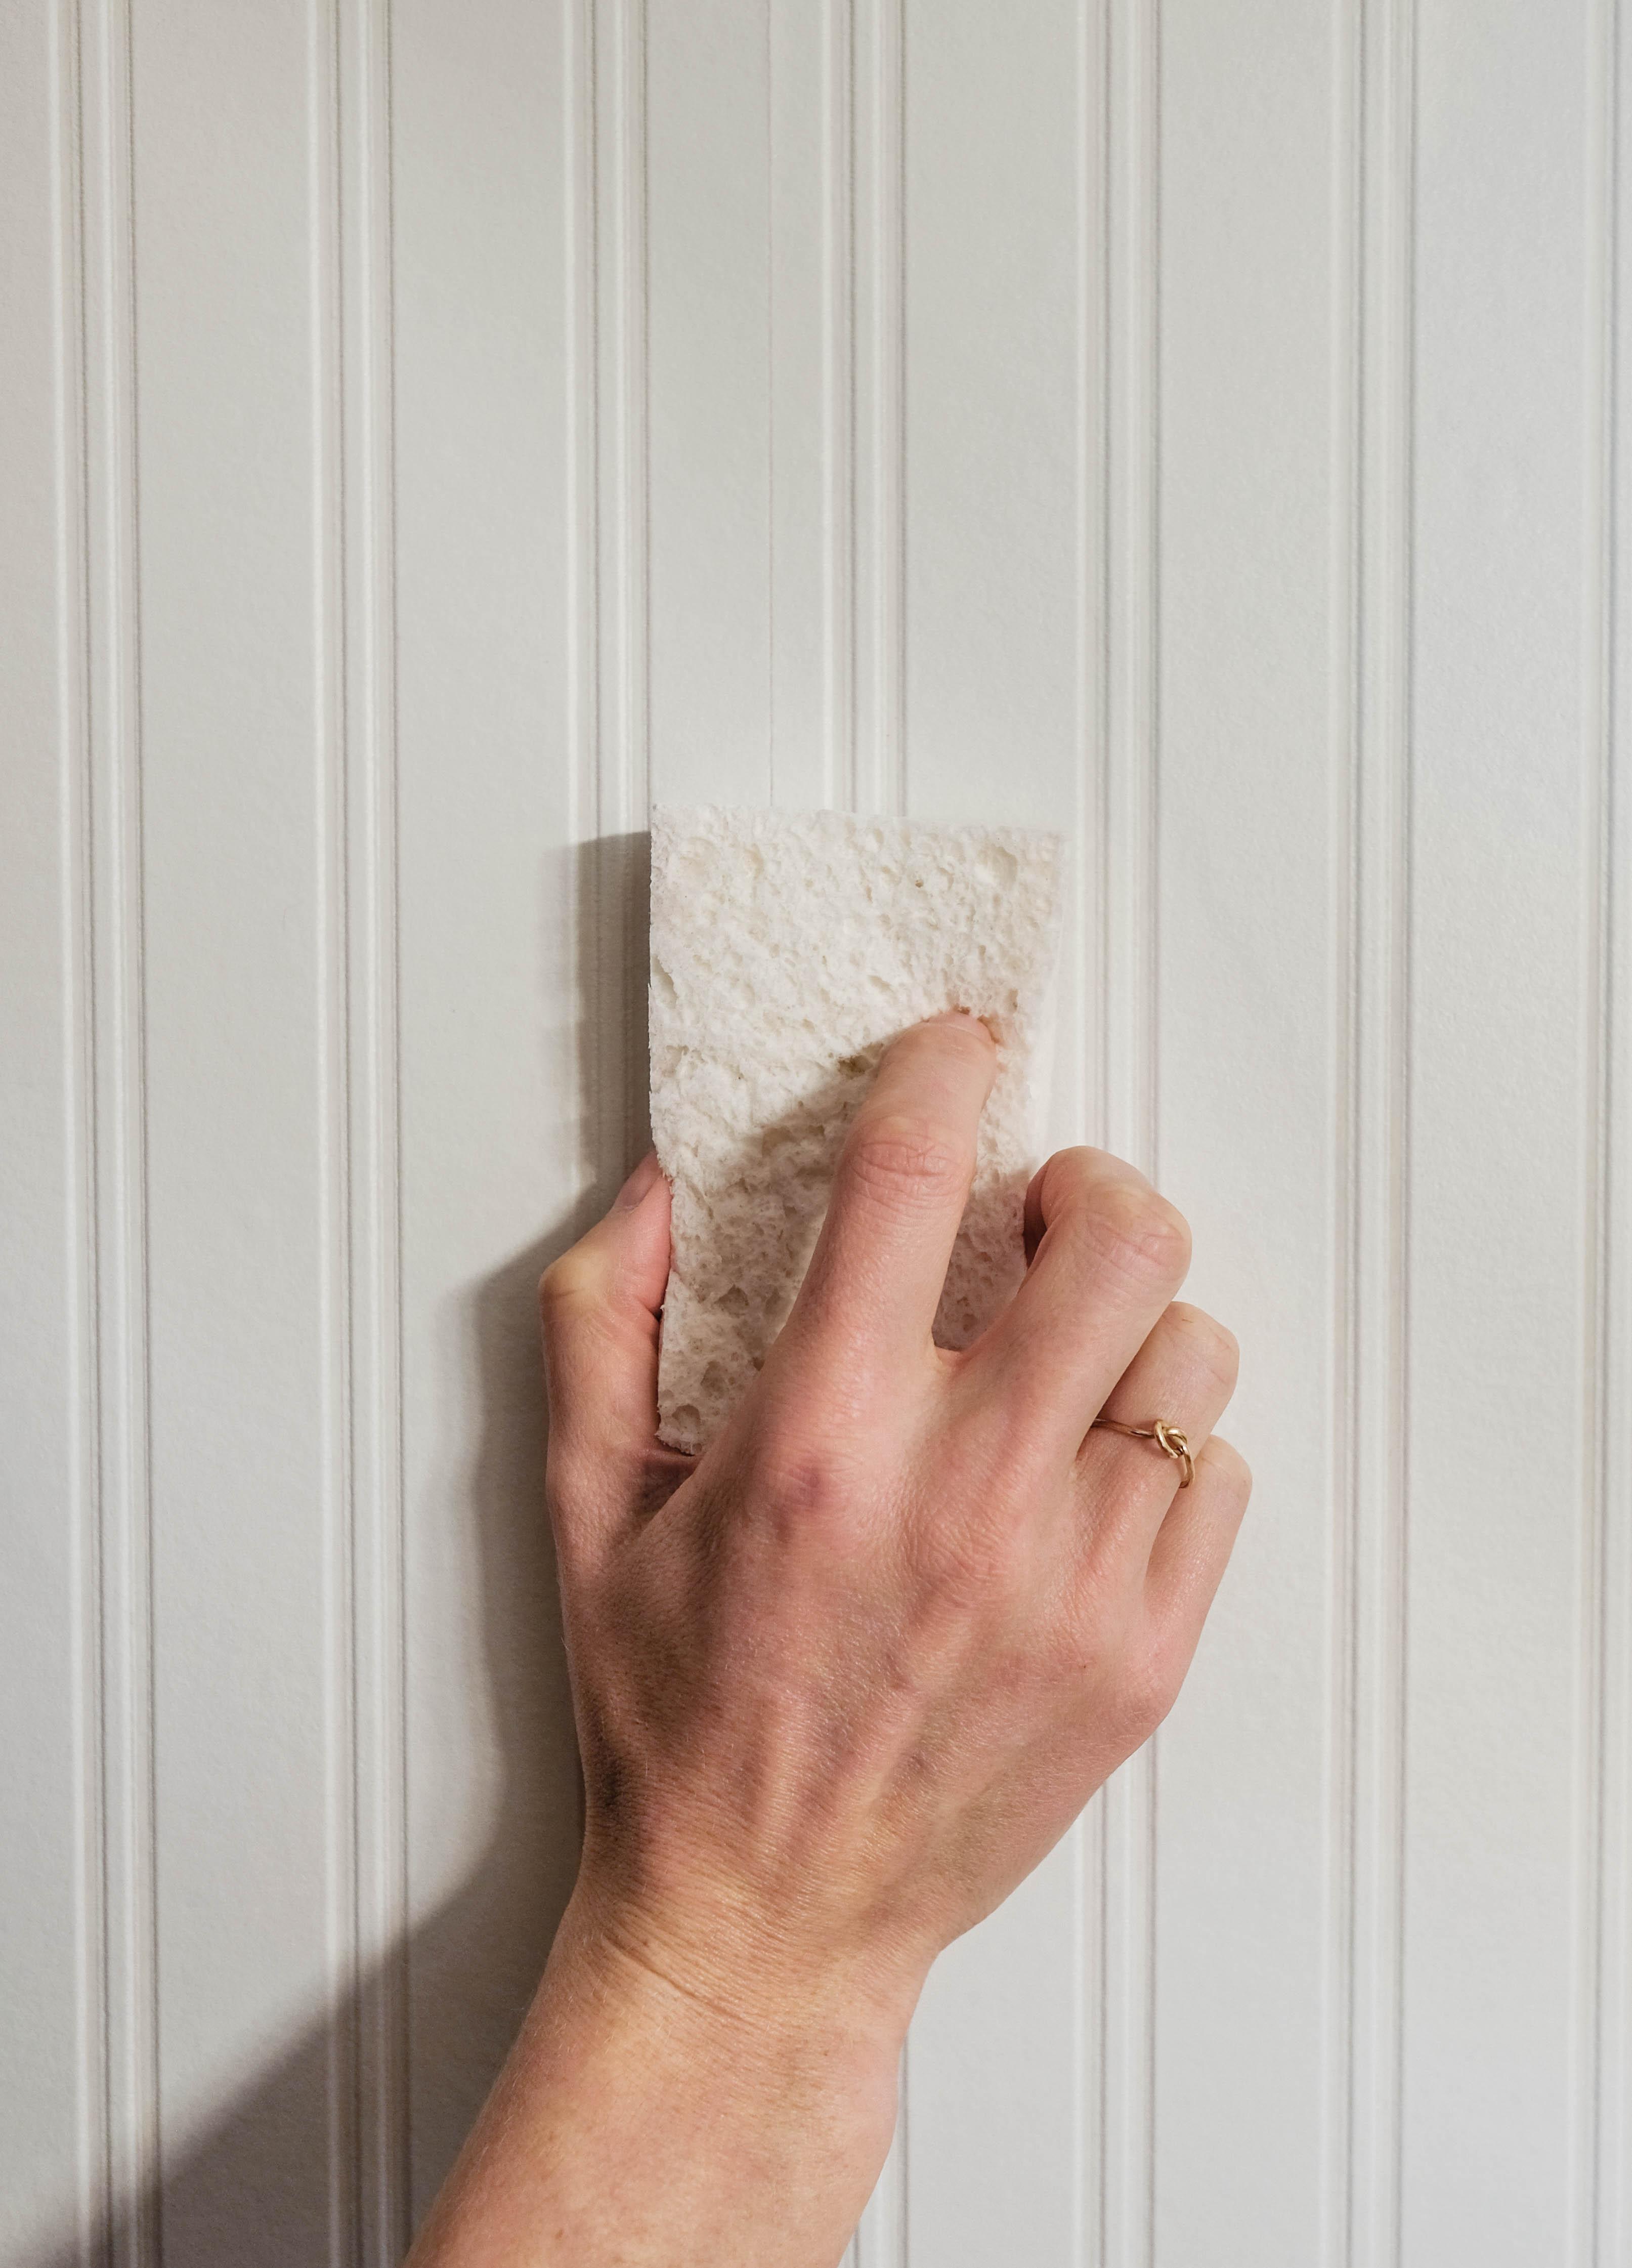 Closeup of a hand holding a sponge against beadboard wallpaper